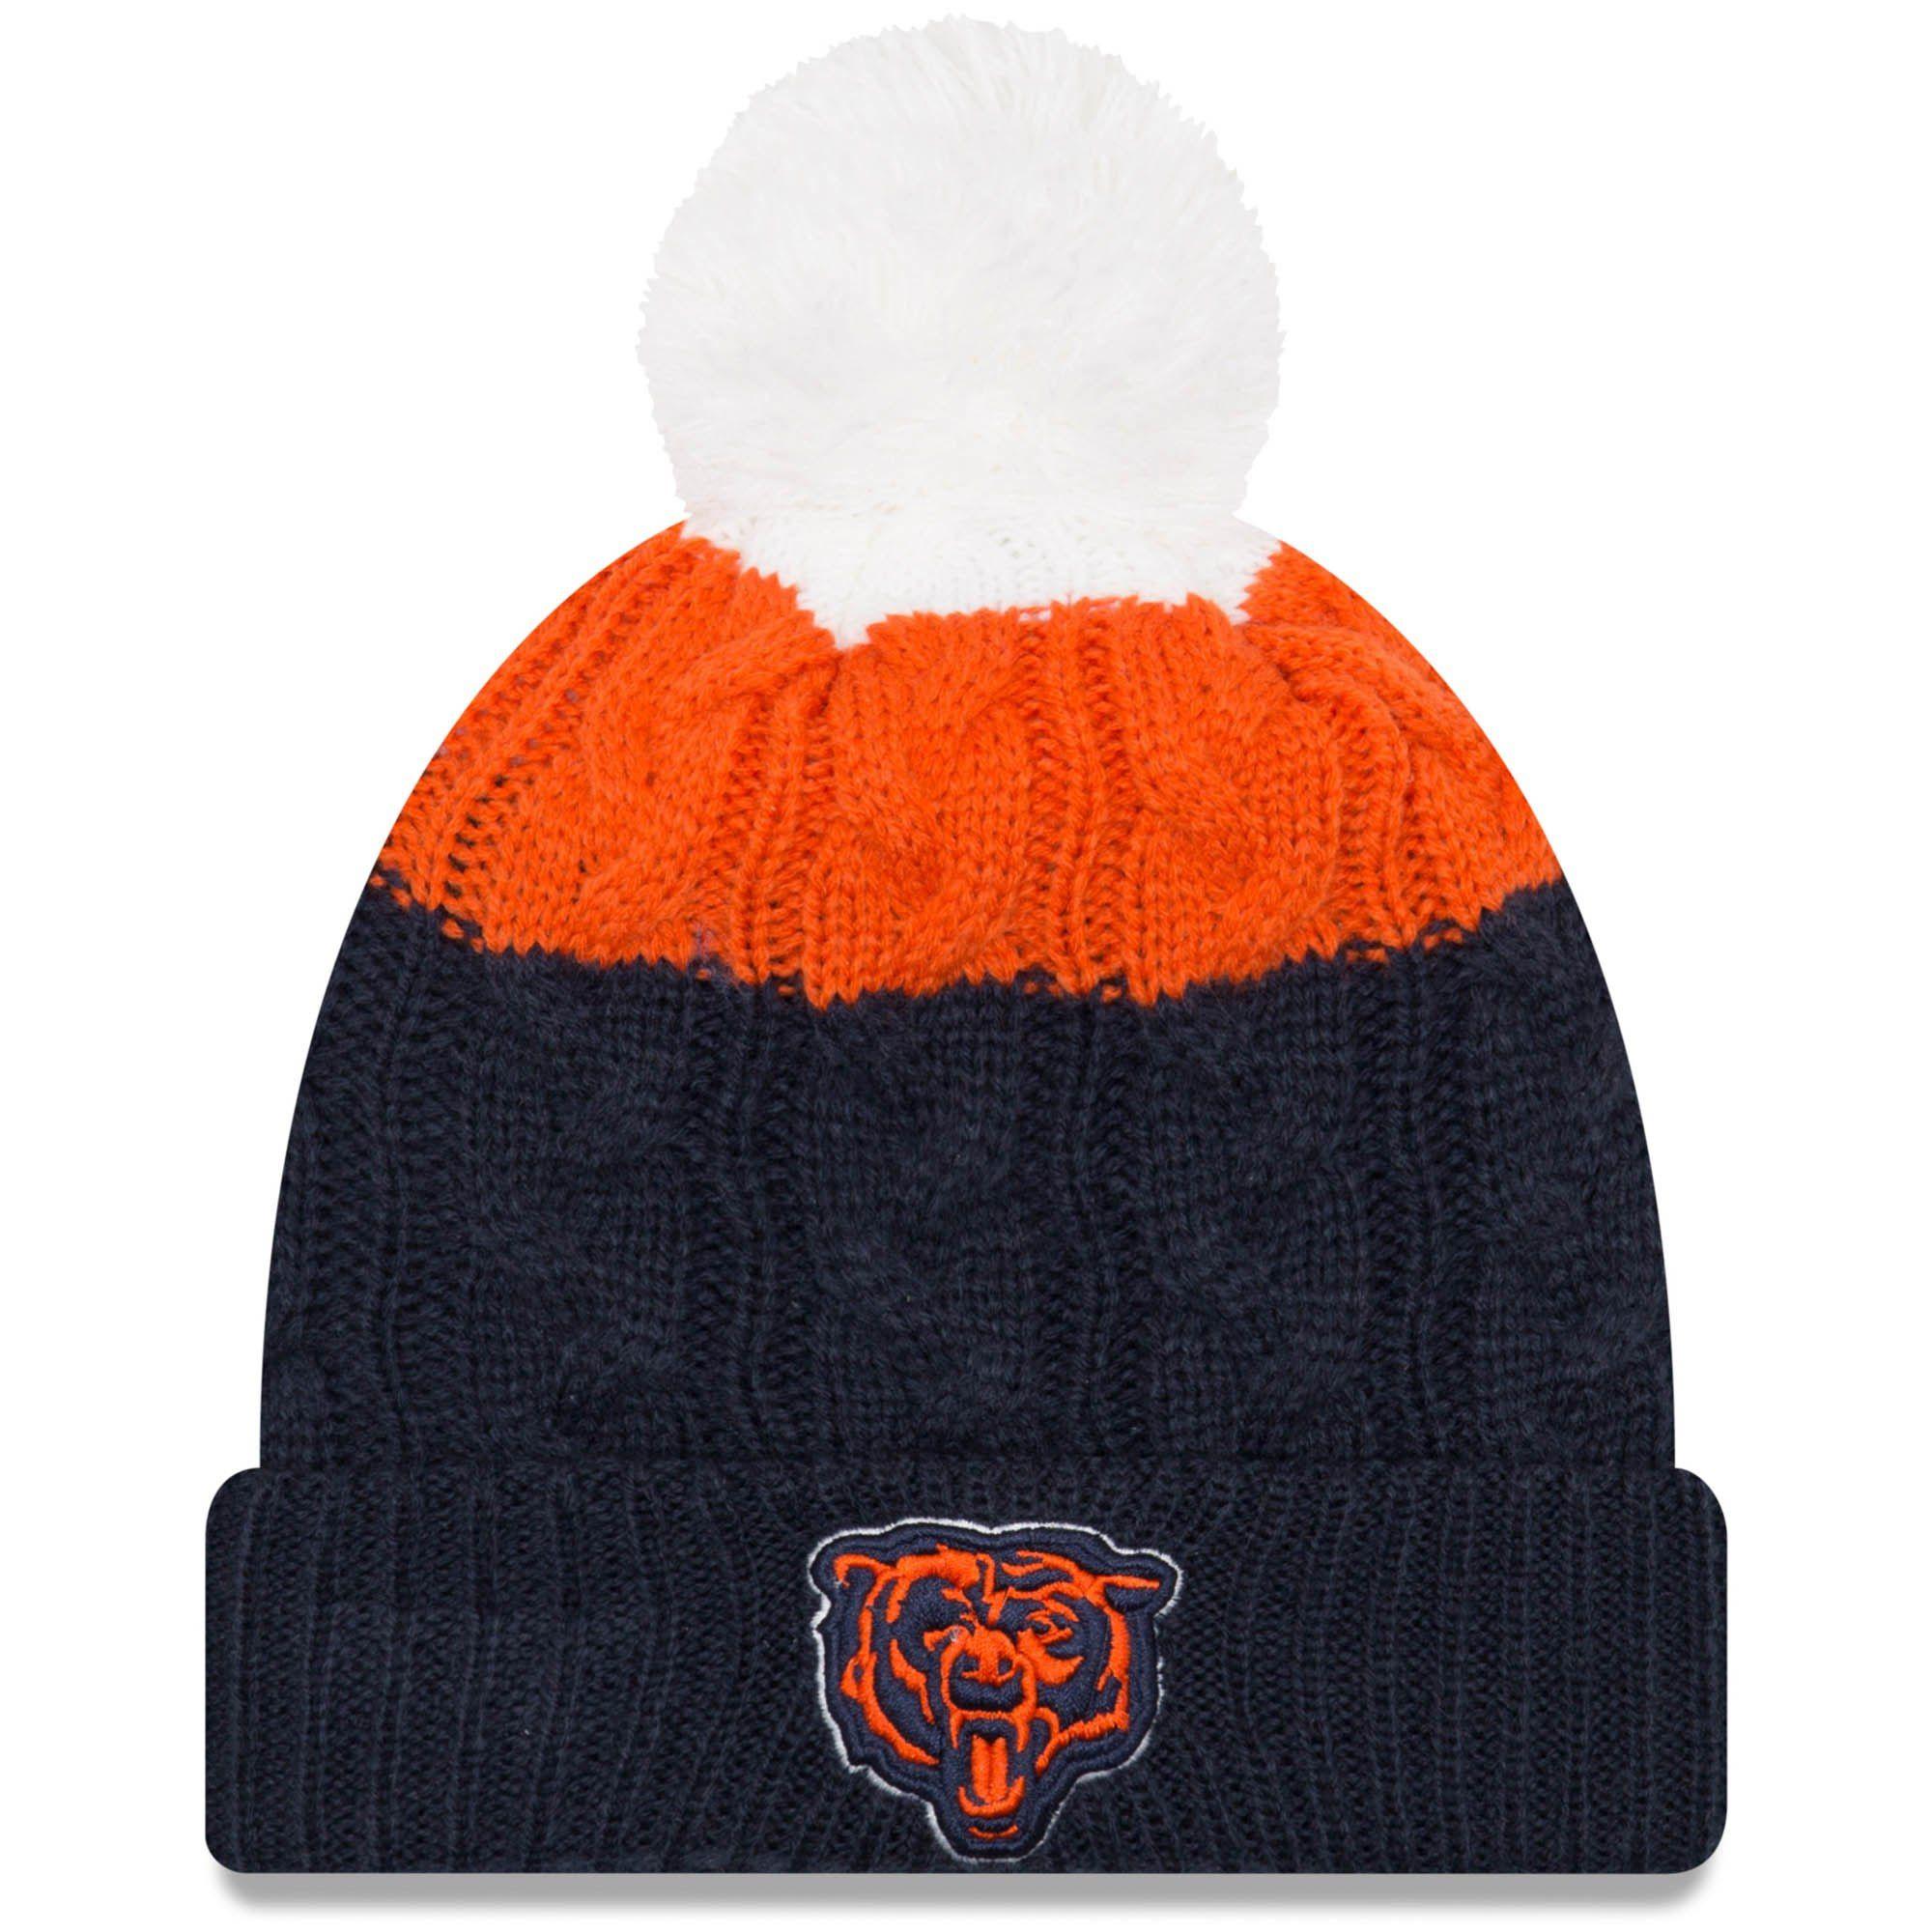 Women s Chicago Bears New Era White Navy Alternate Logo Layered Up 2 Cuffed  Knit Hat with Pom 838b7a5c9